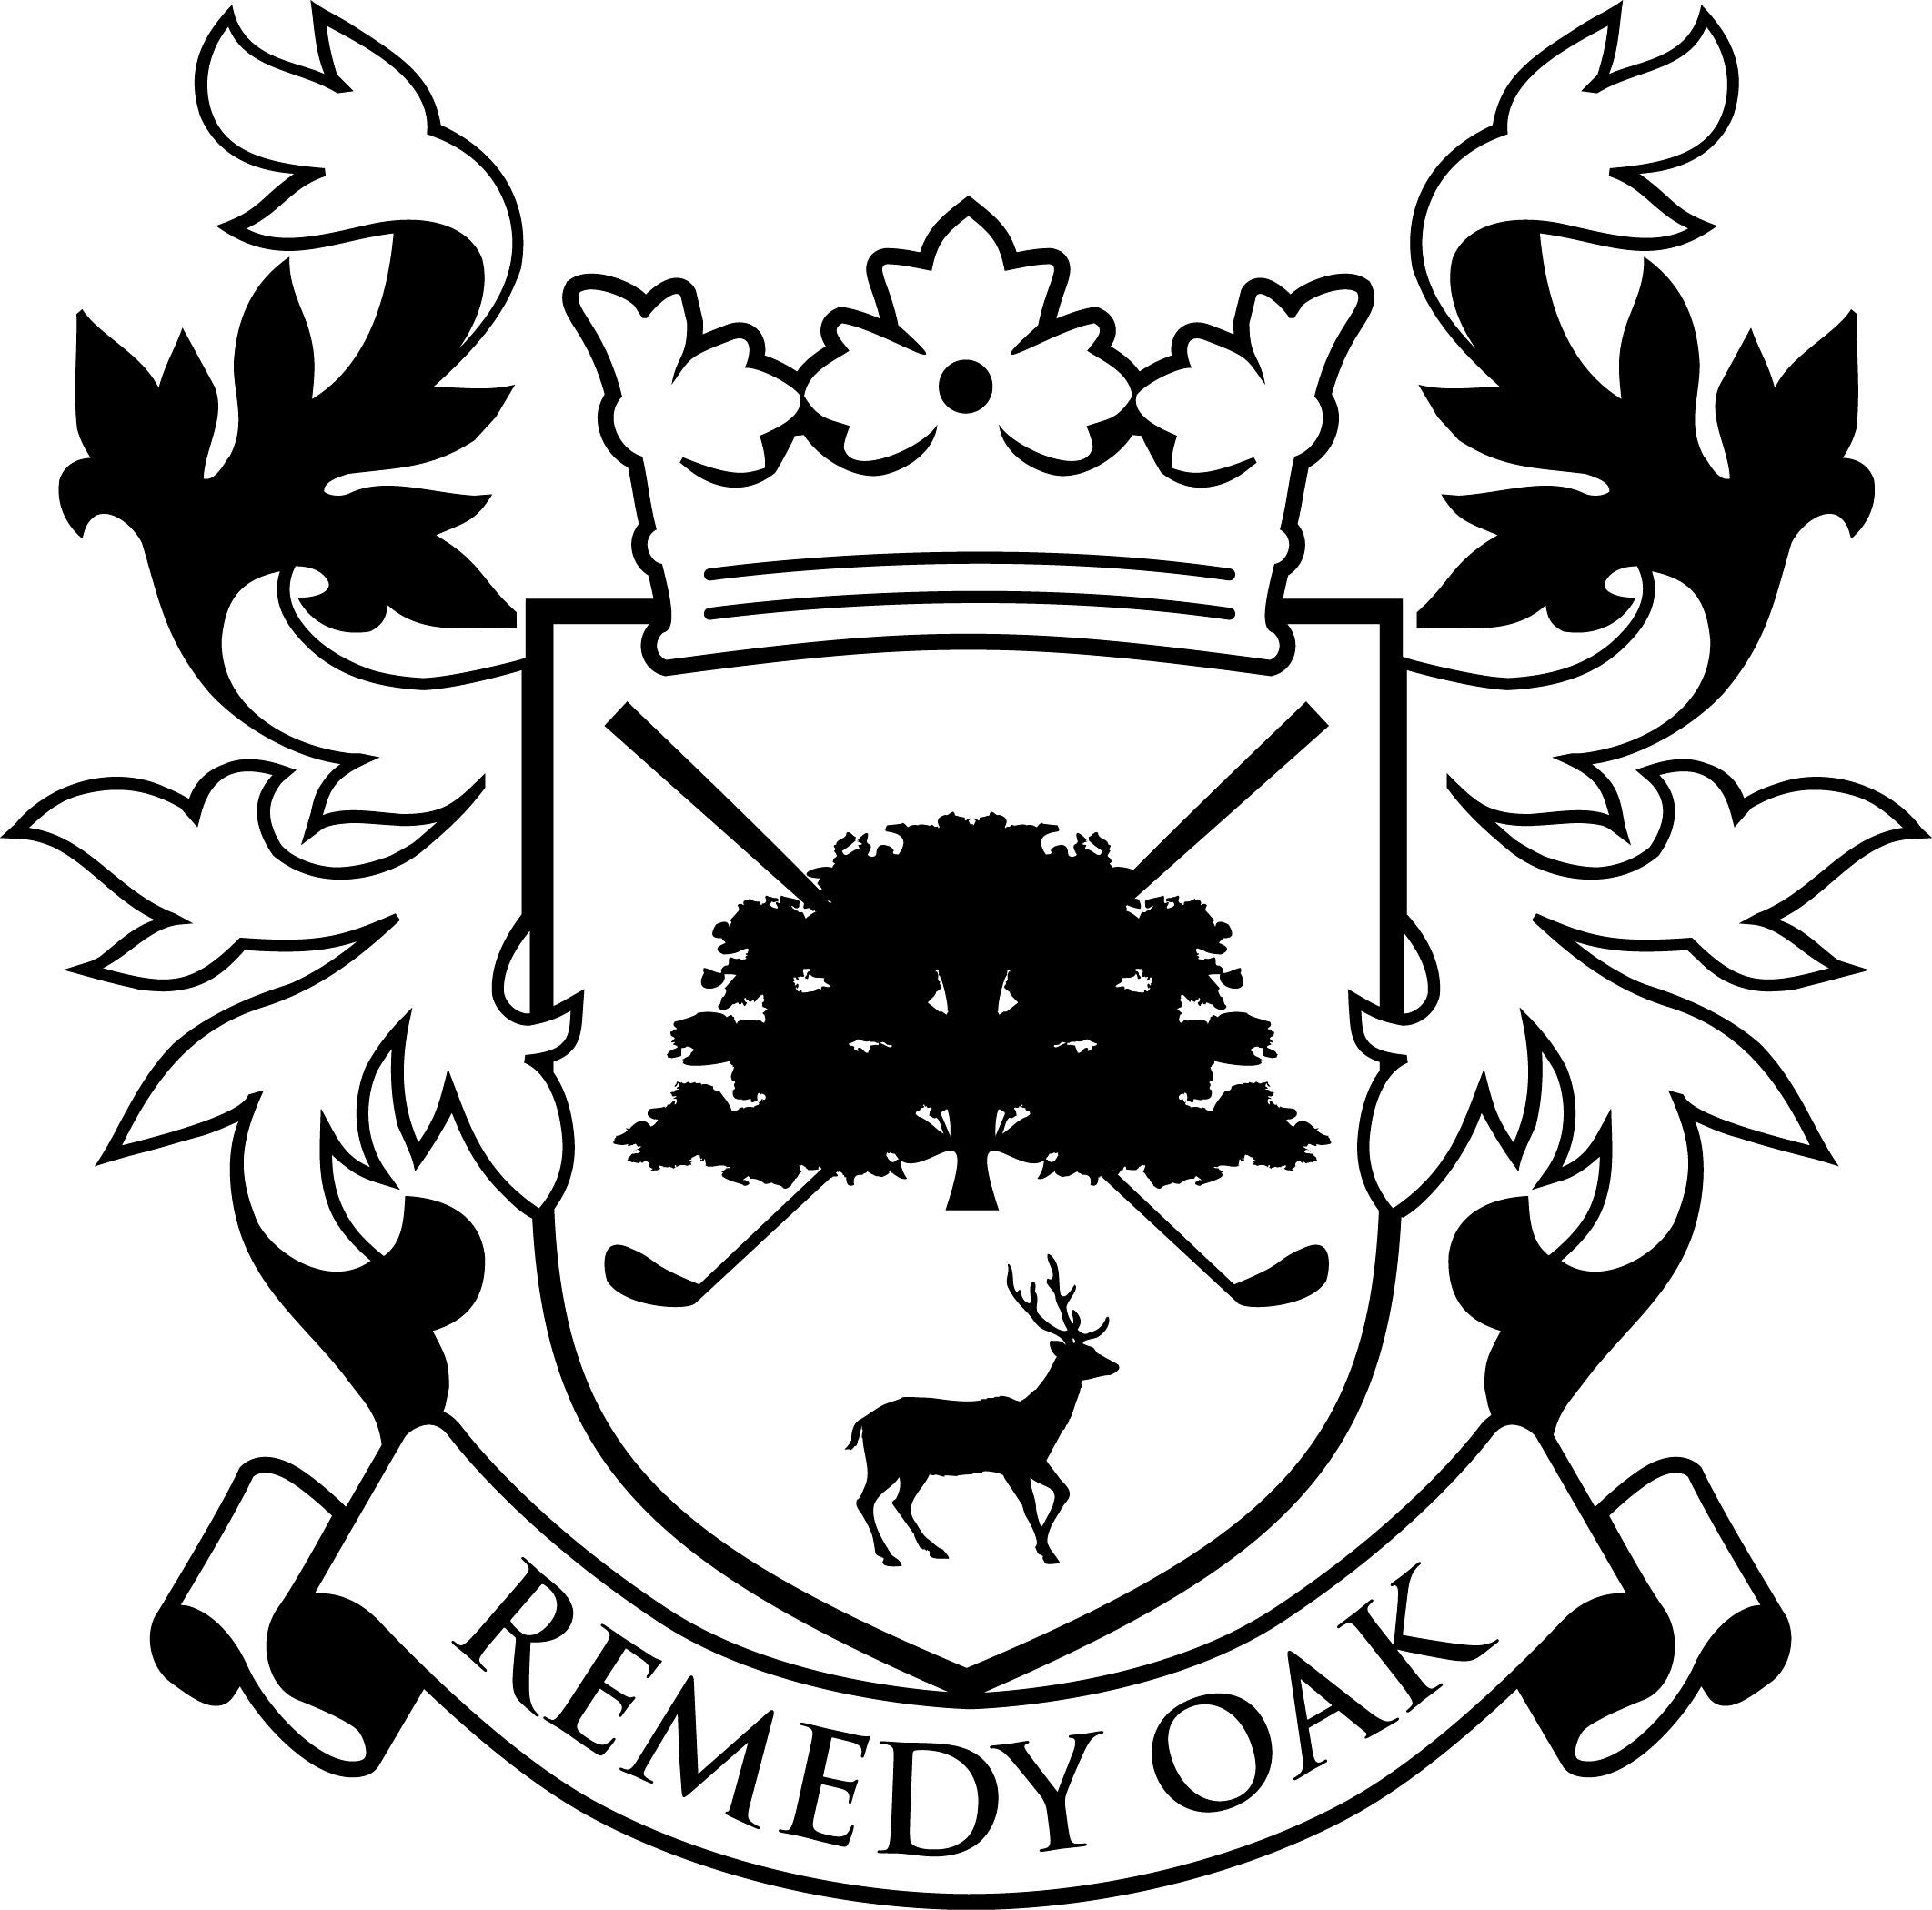 remedy-oak